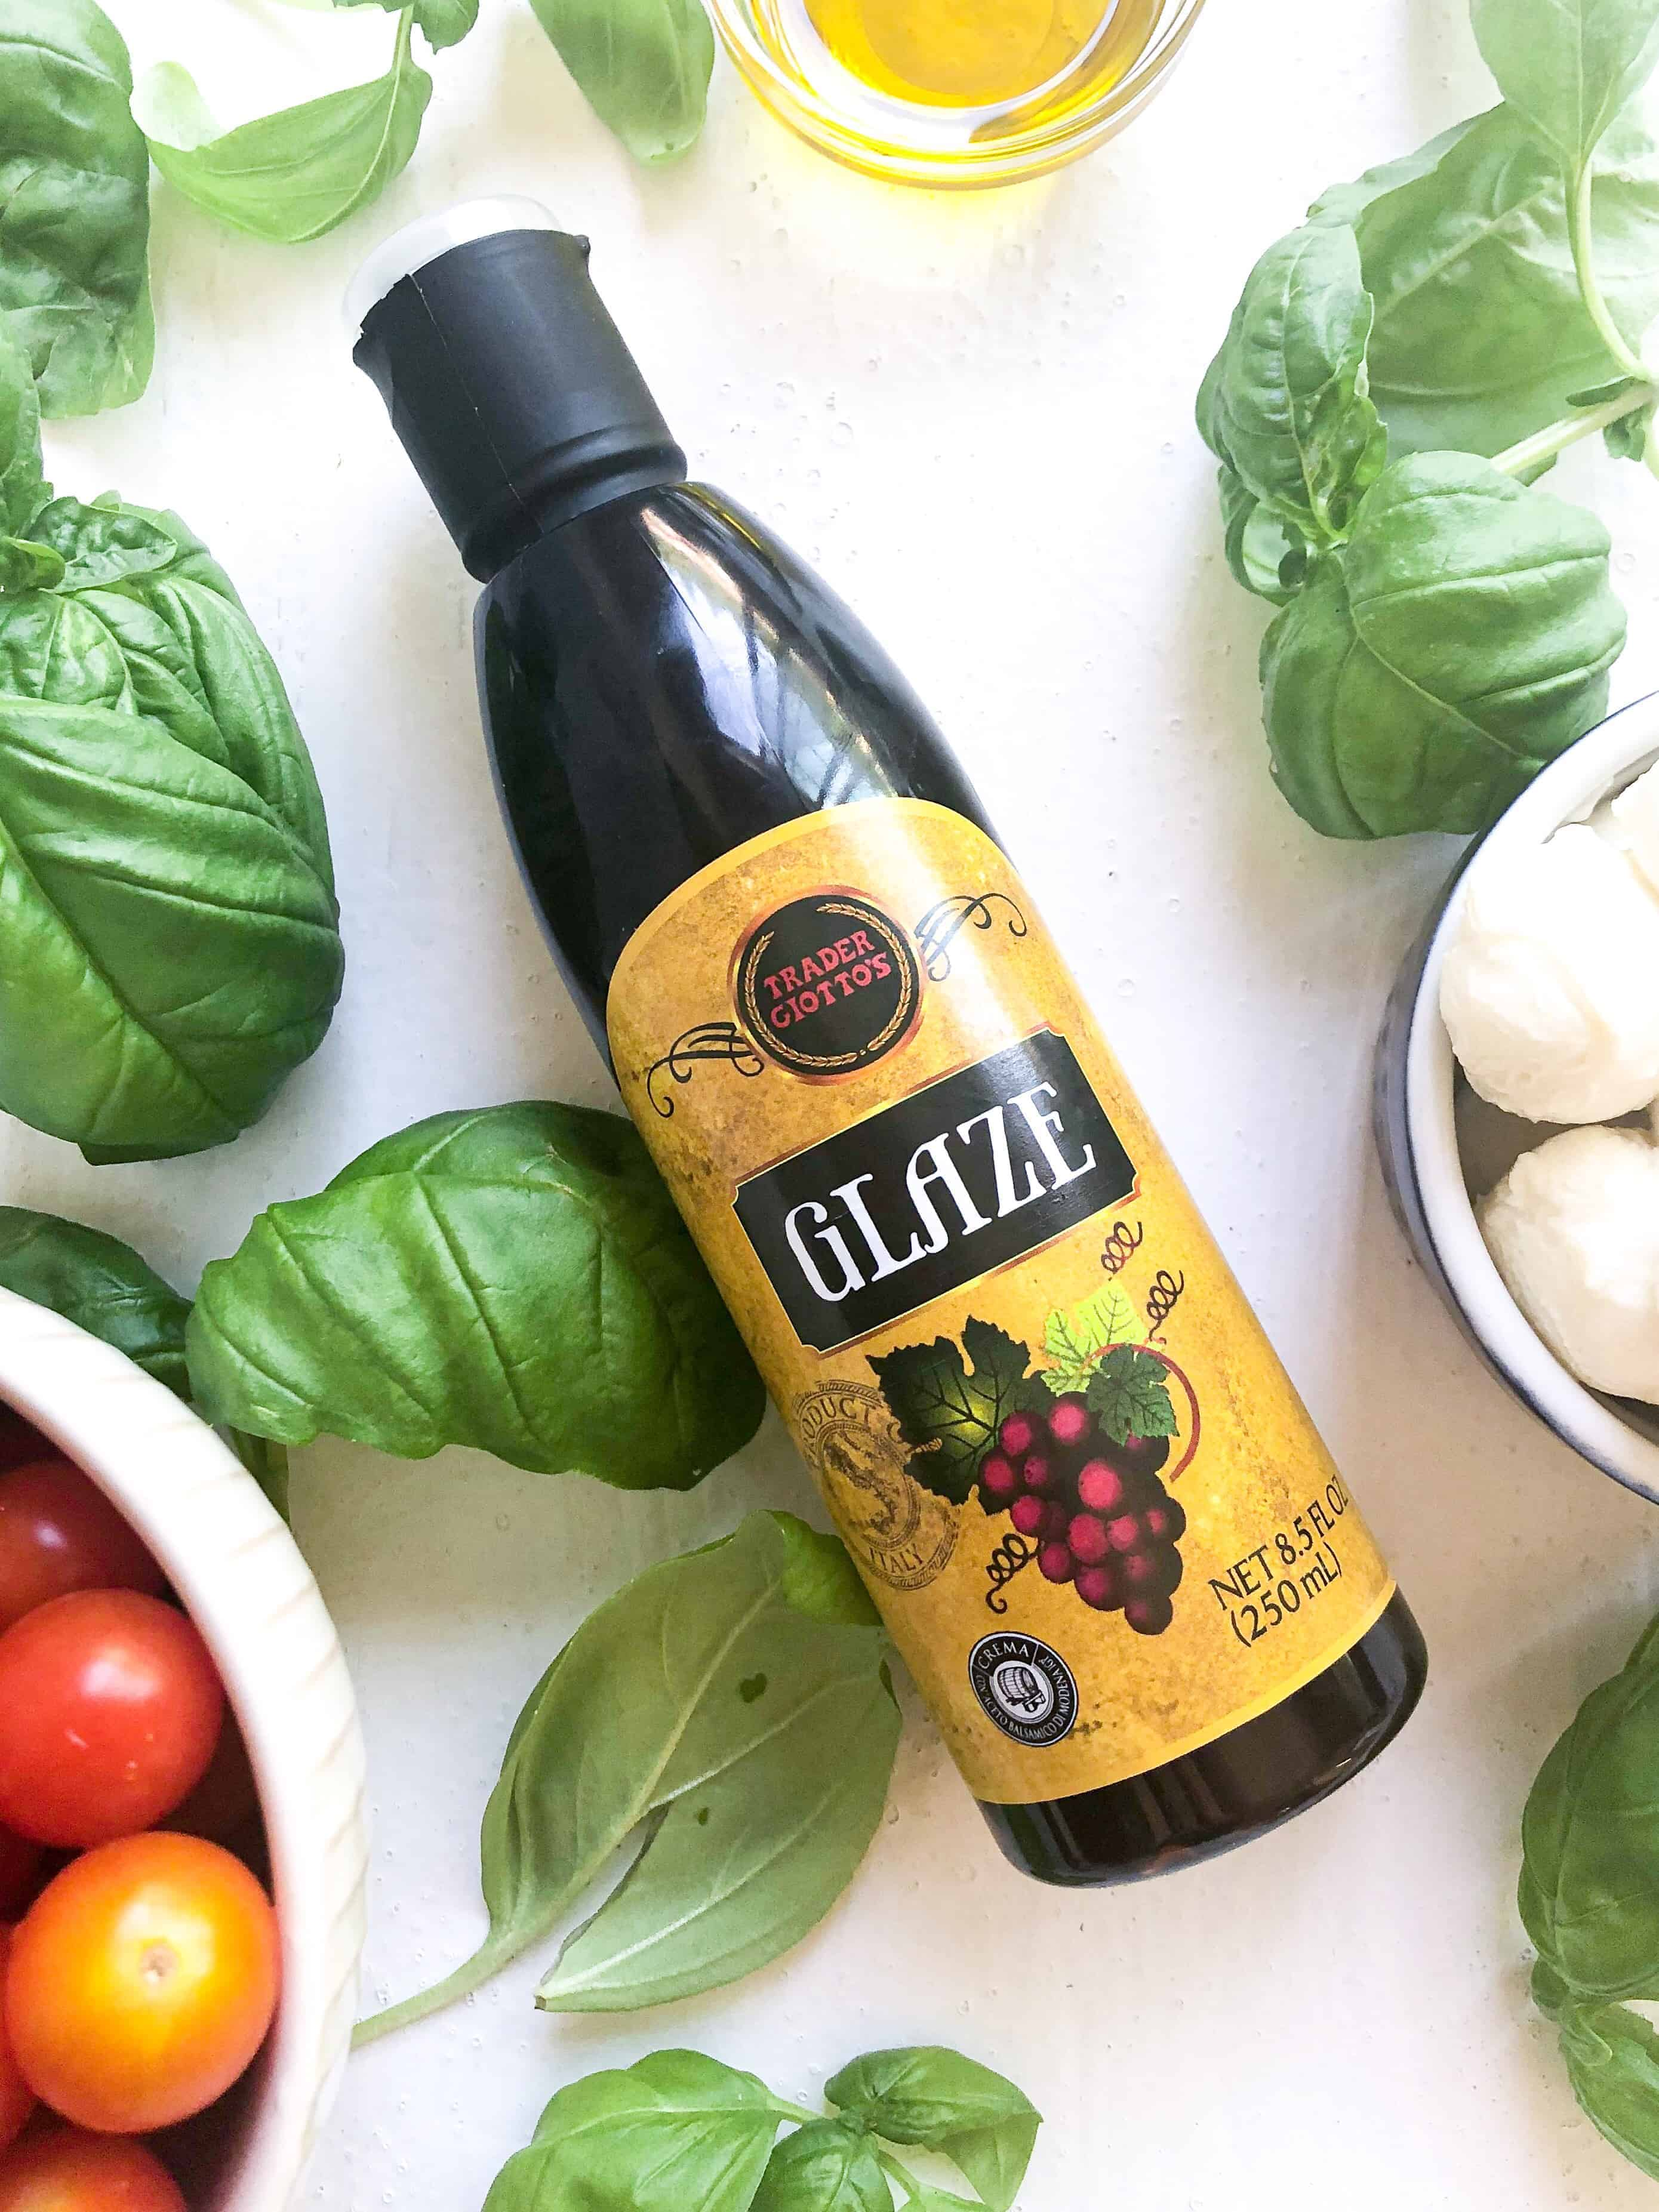 A bottle of balsamic glaze